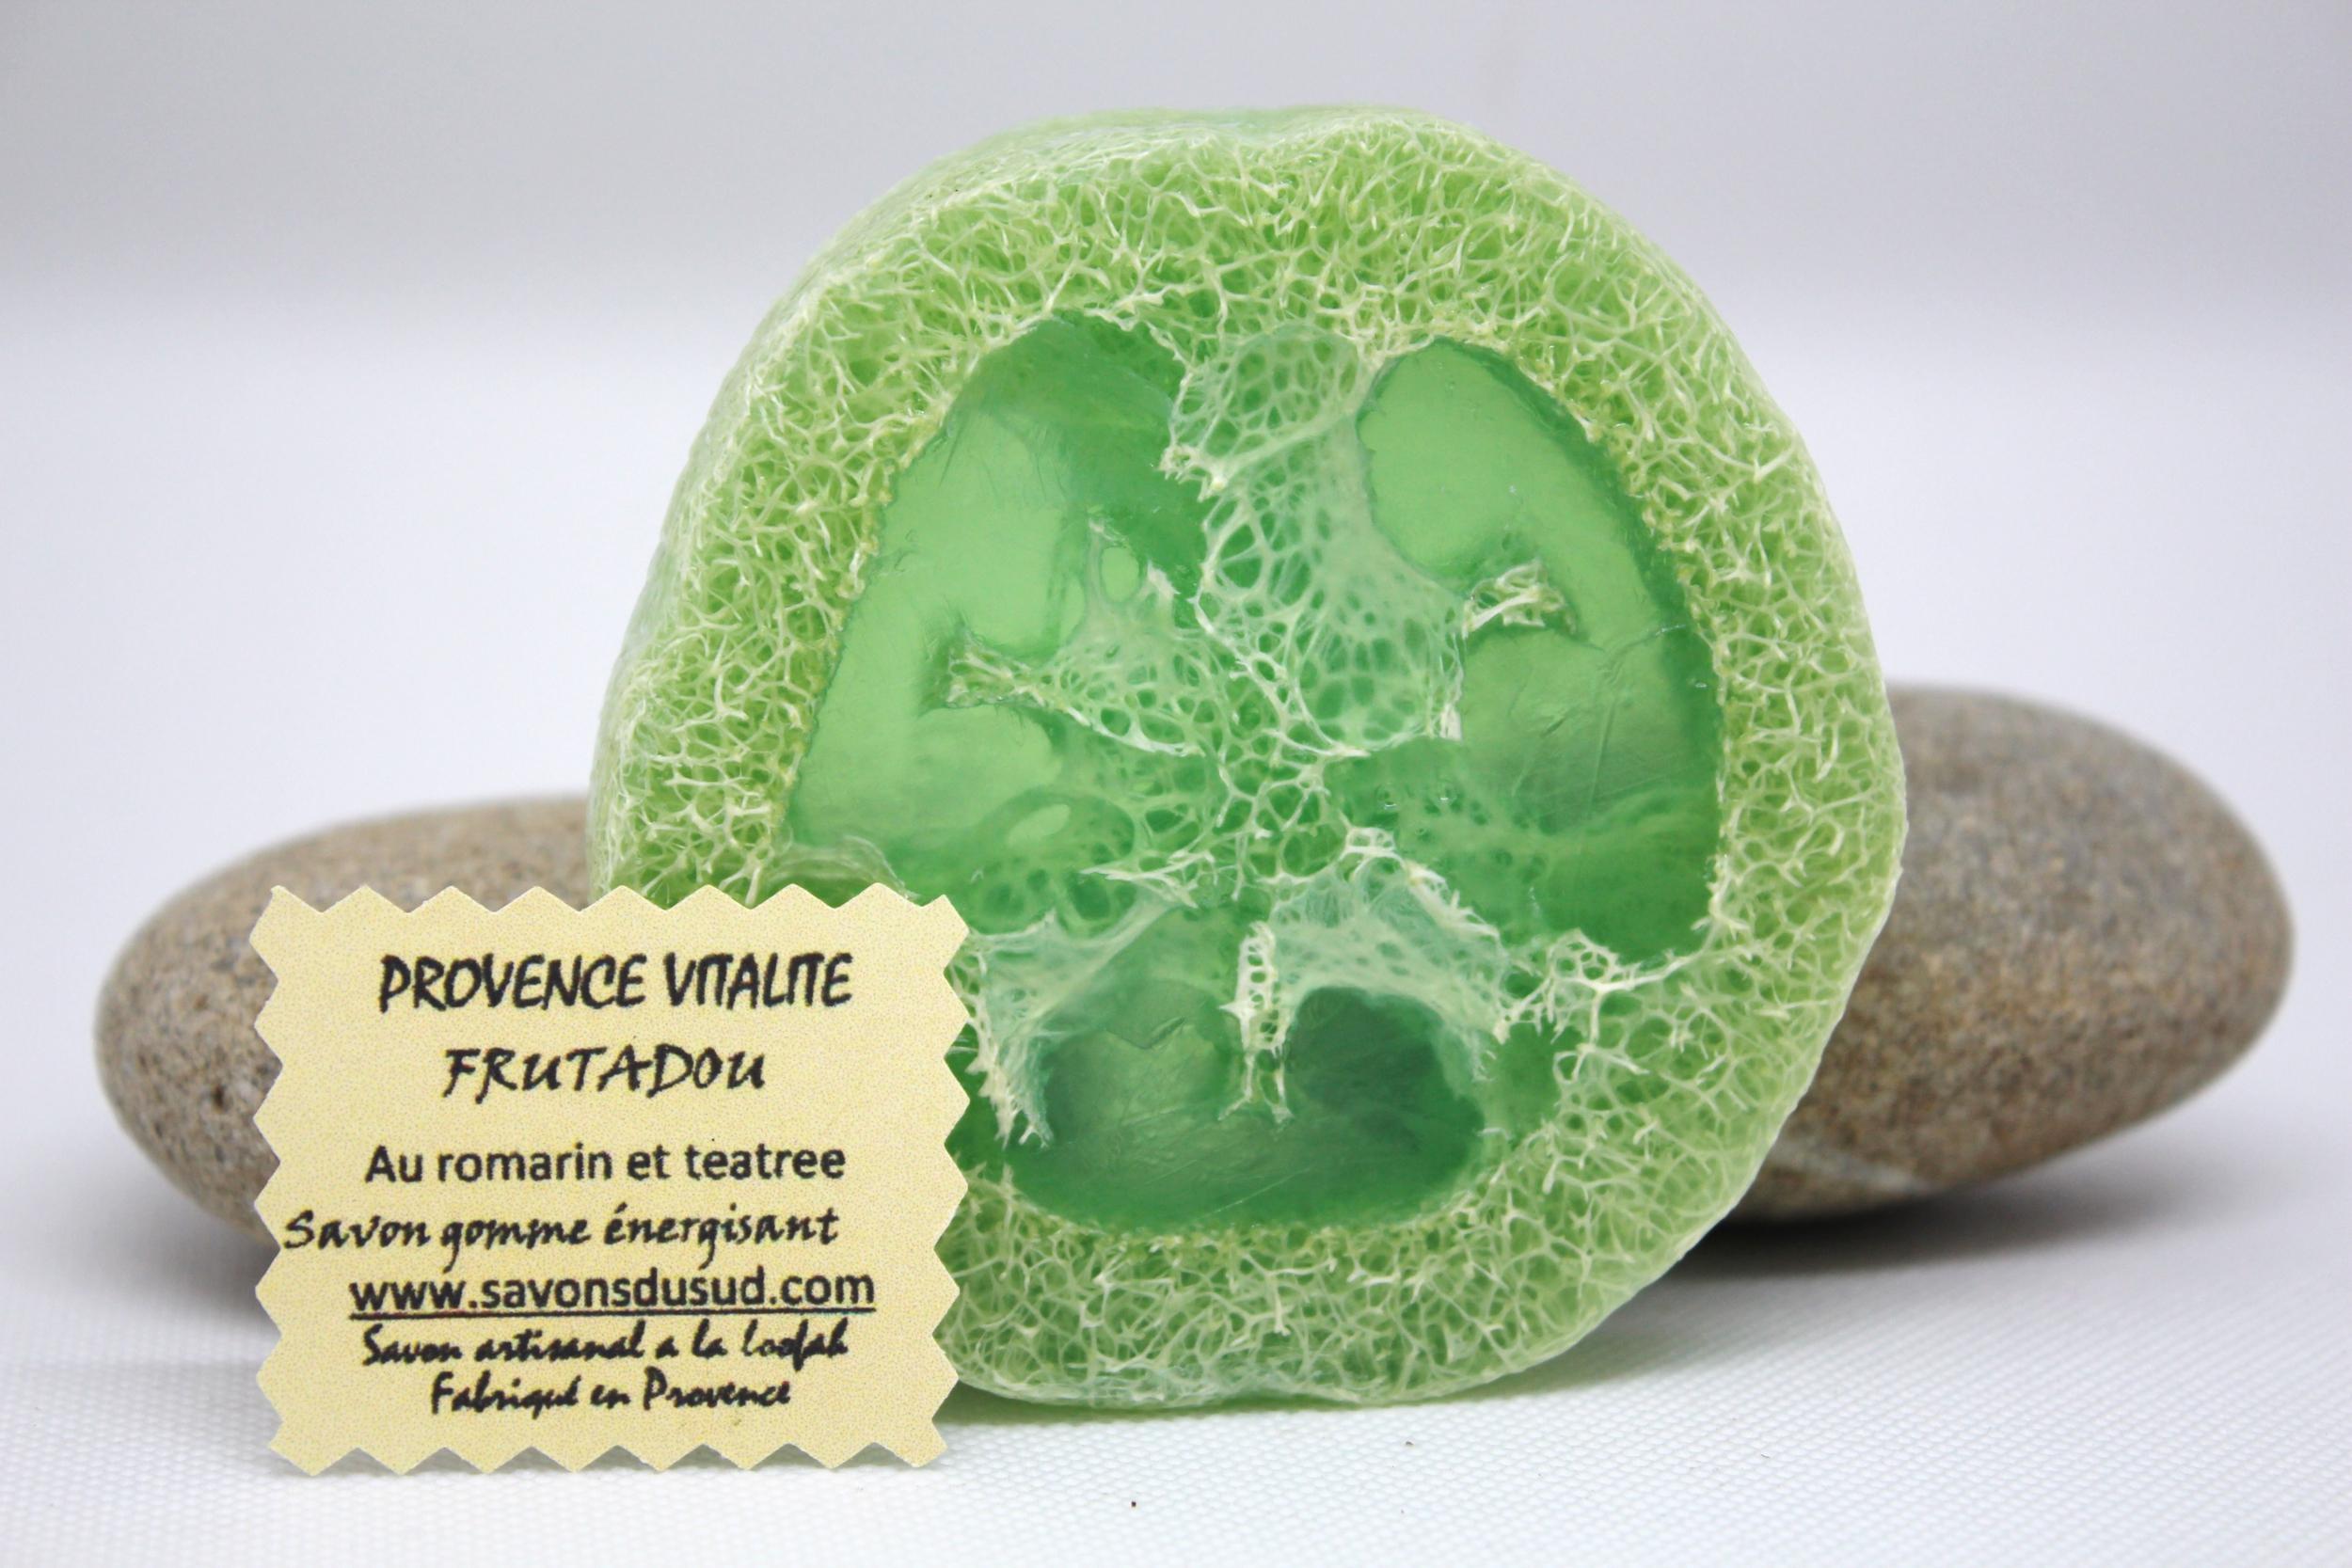 Frutadou Provence Vitalité (romarin)